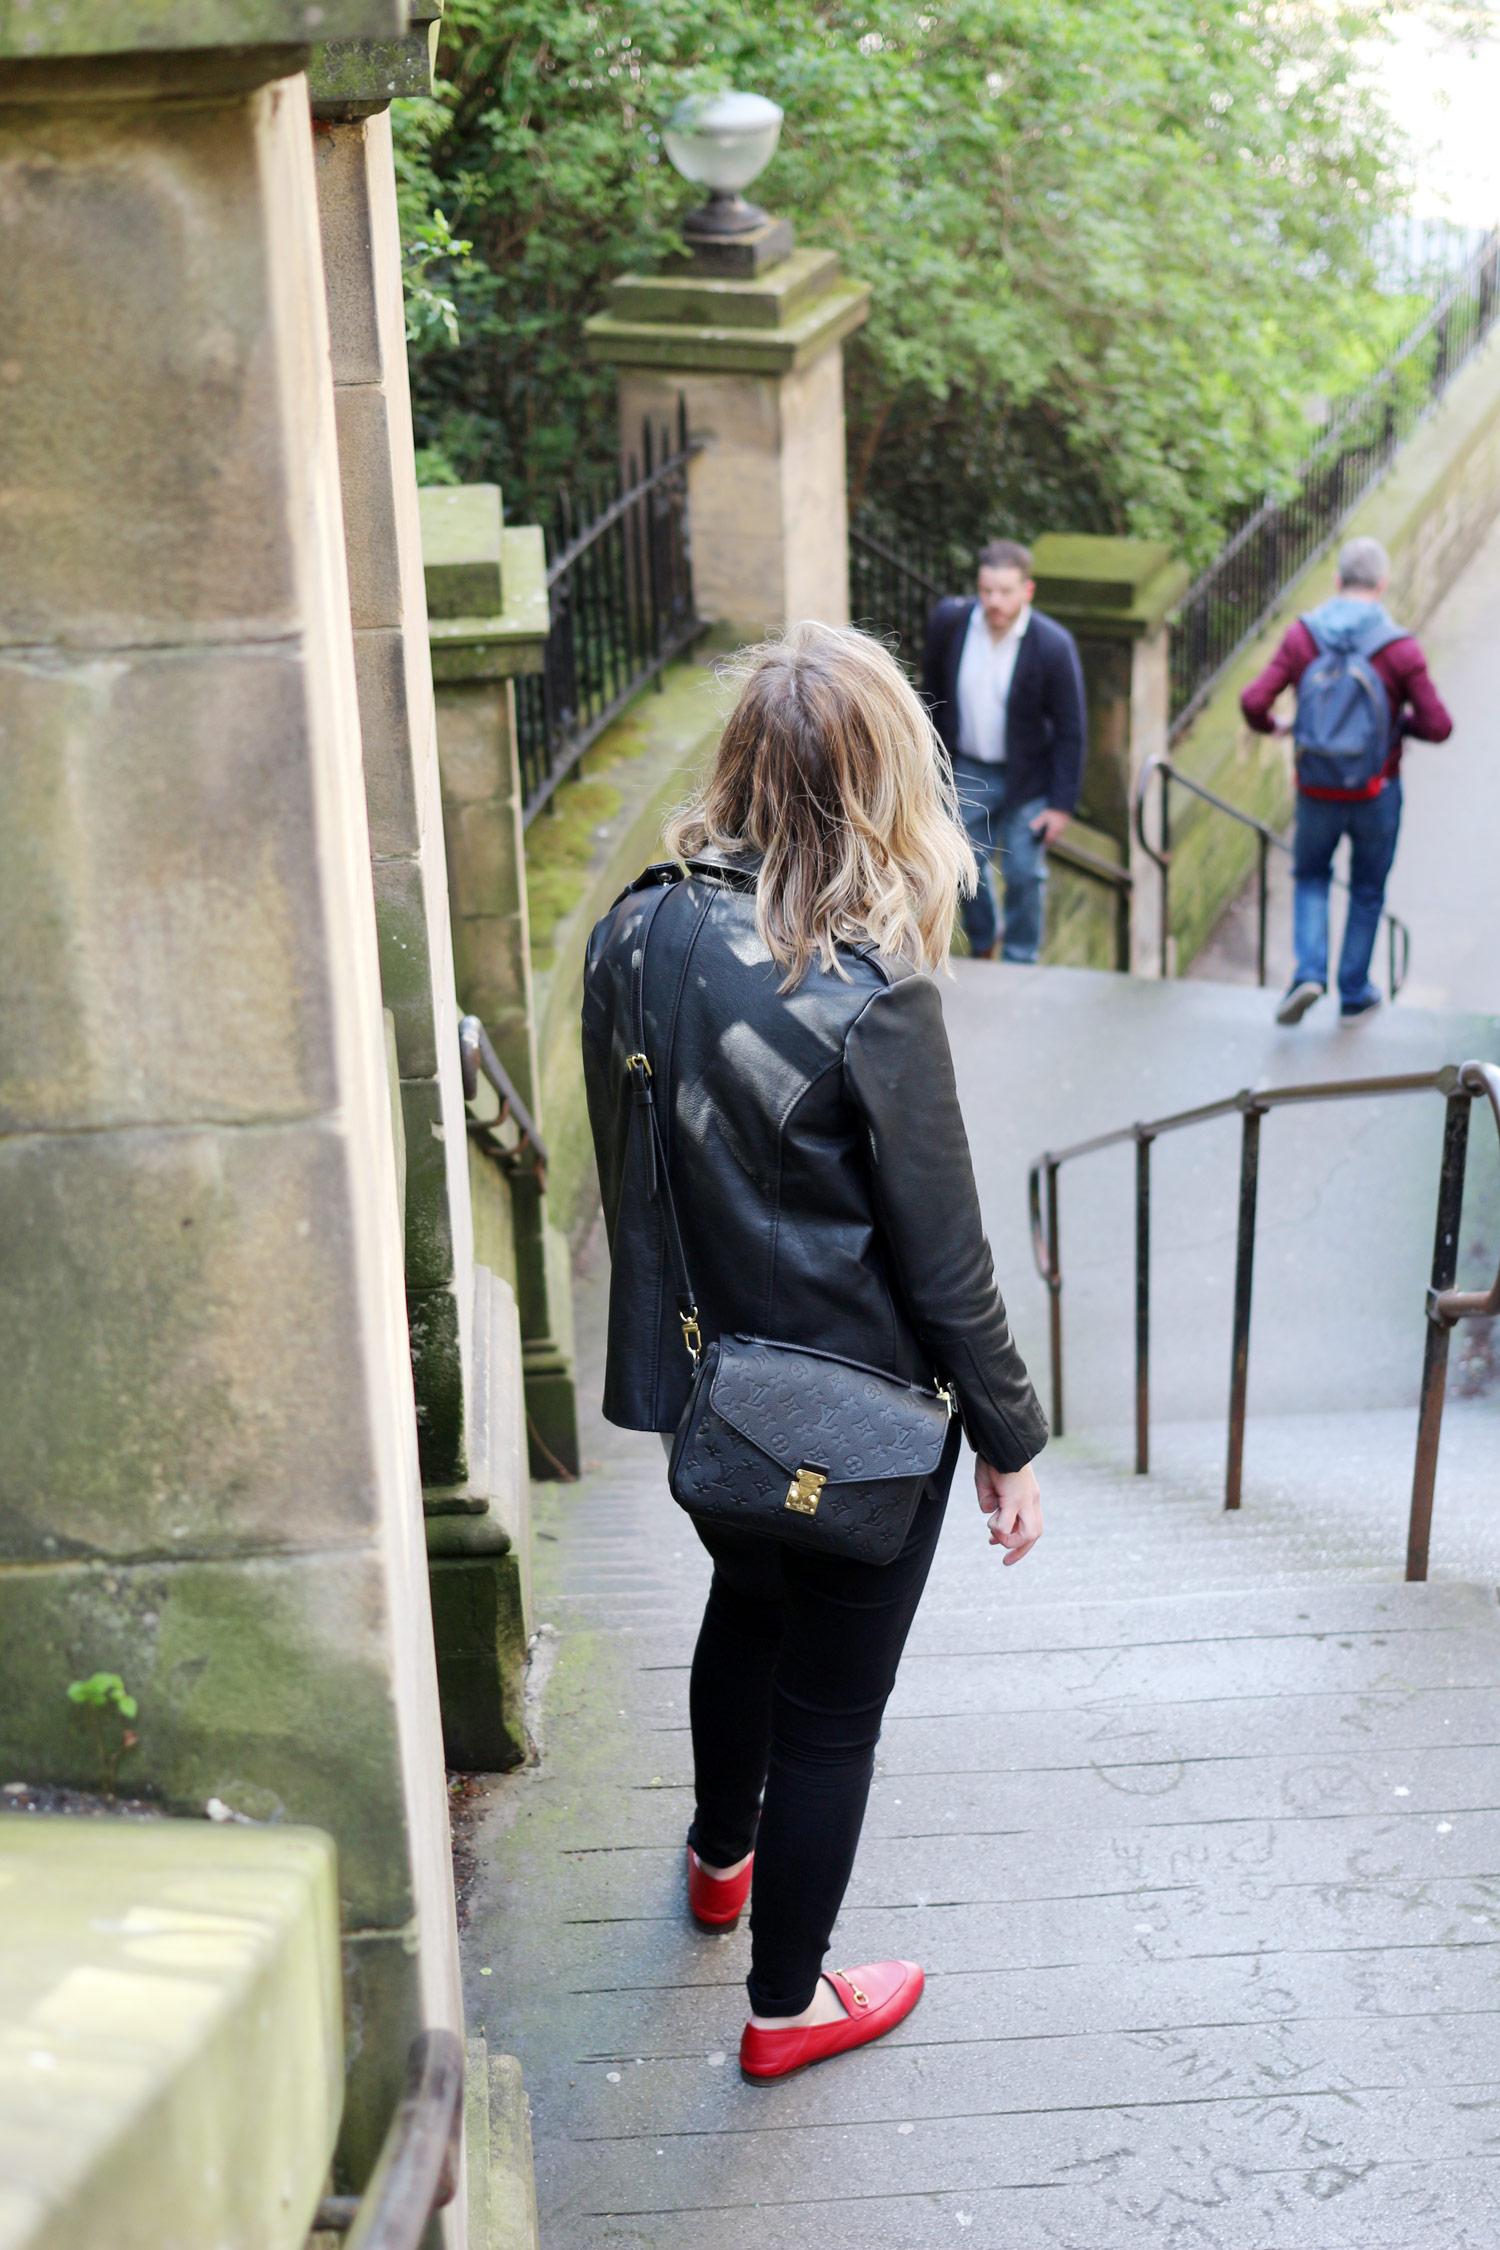 edinburgh-scotland-mercure-hotels-review-uk-travel-blogger-lifestyle-8